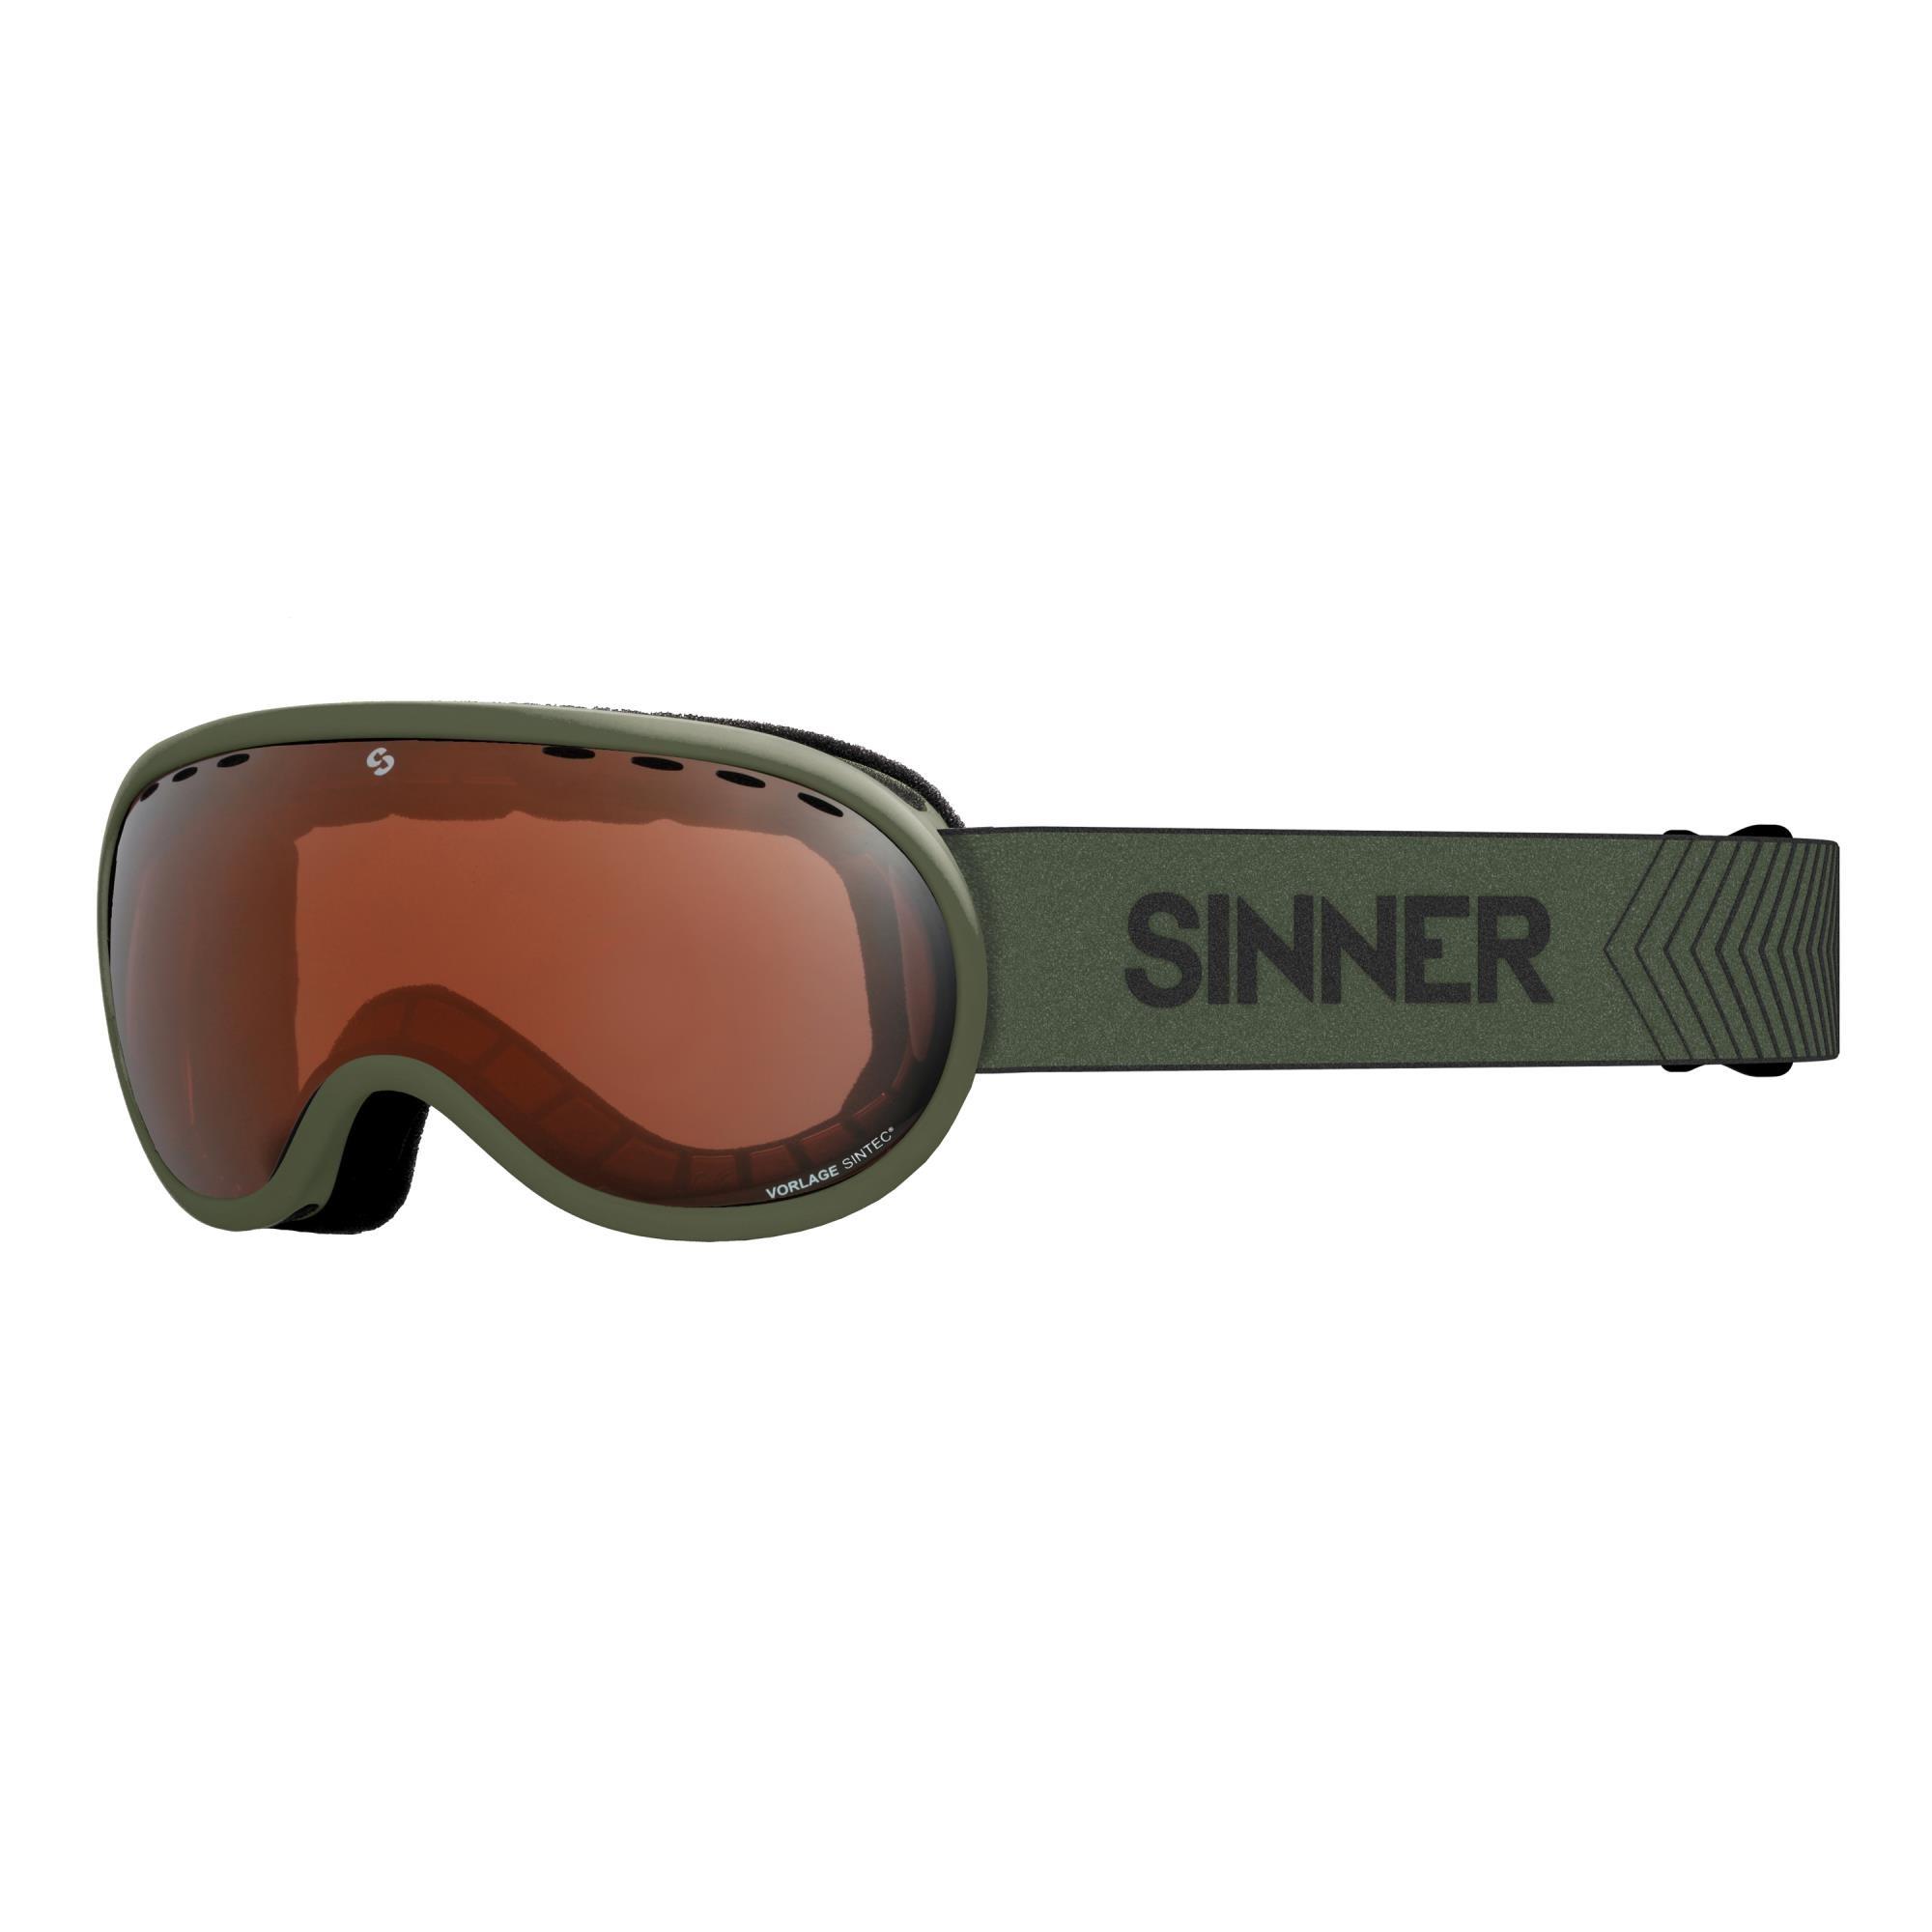 Sinner Vorlage Skibril - Mosgroen - Oranje Sintec® Lens